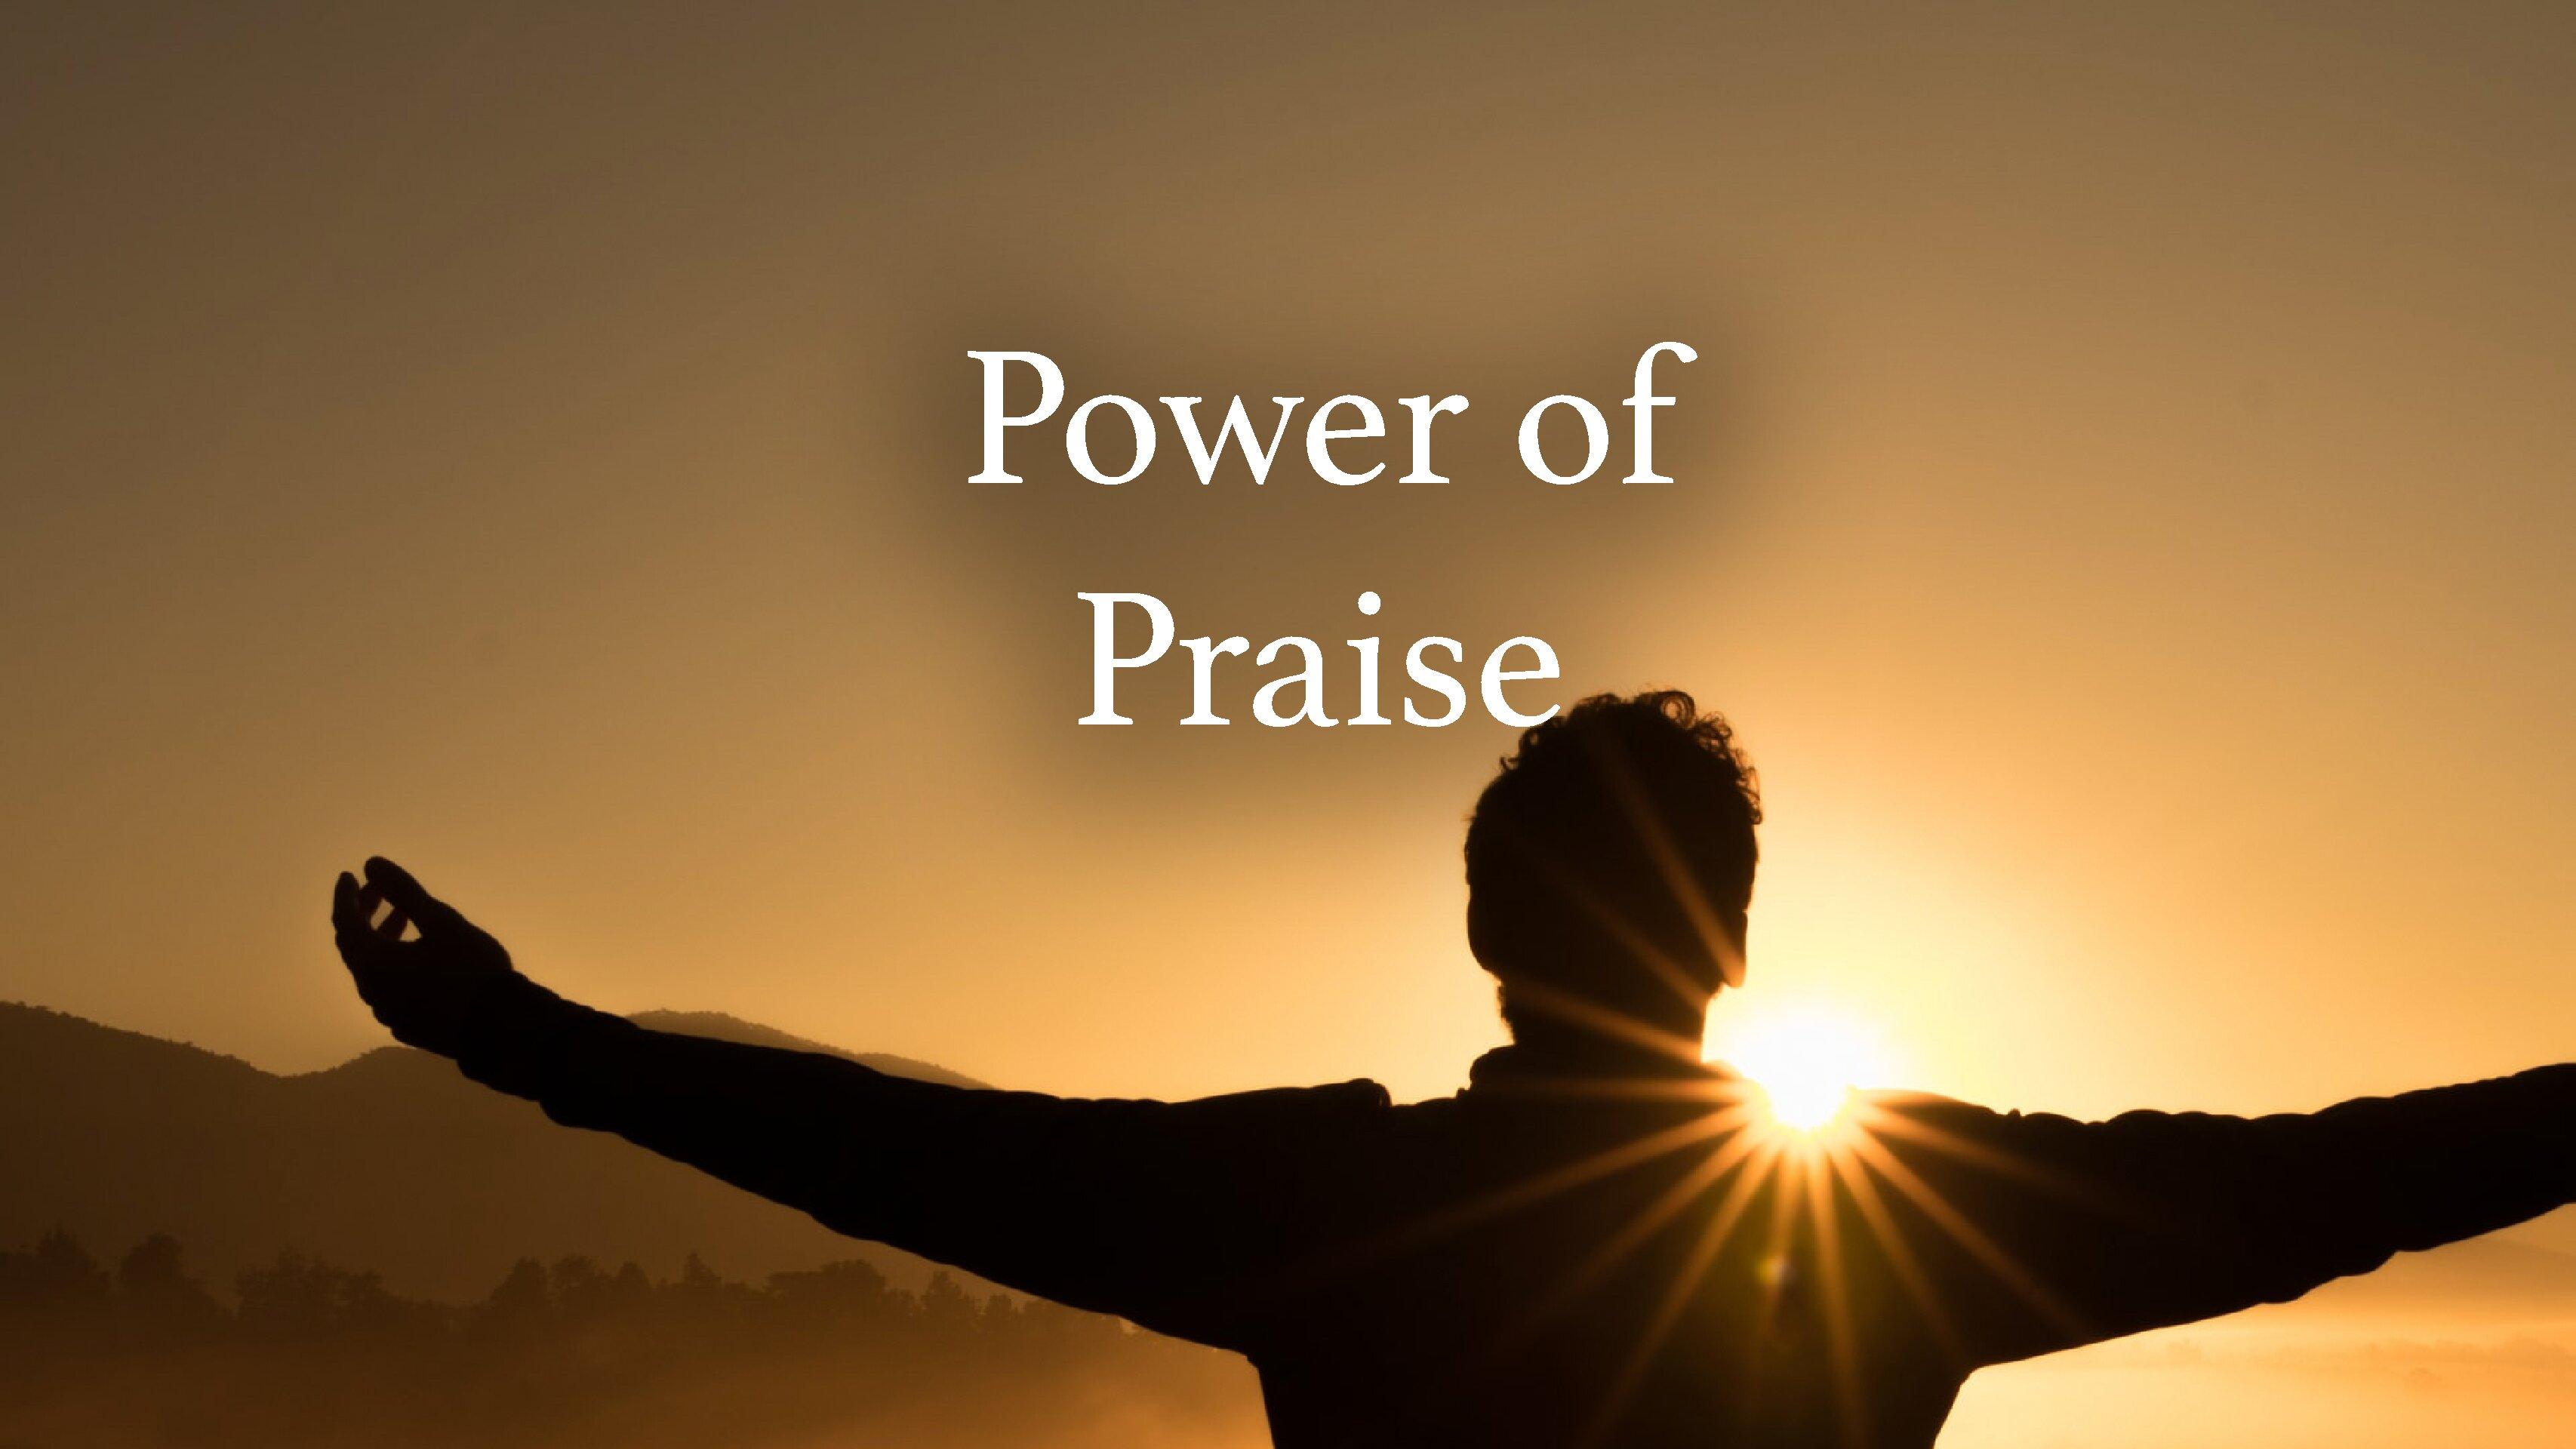 Power of Praise